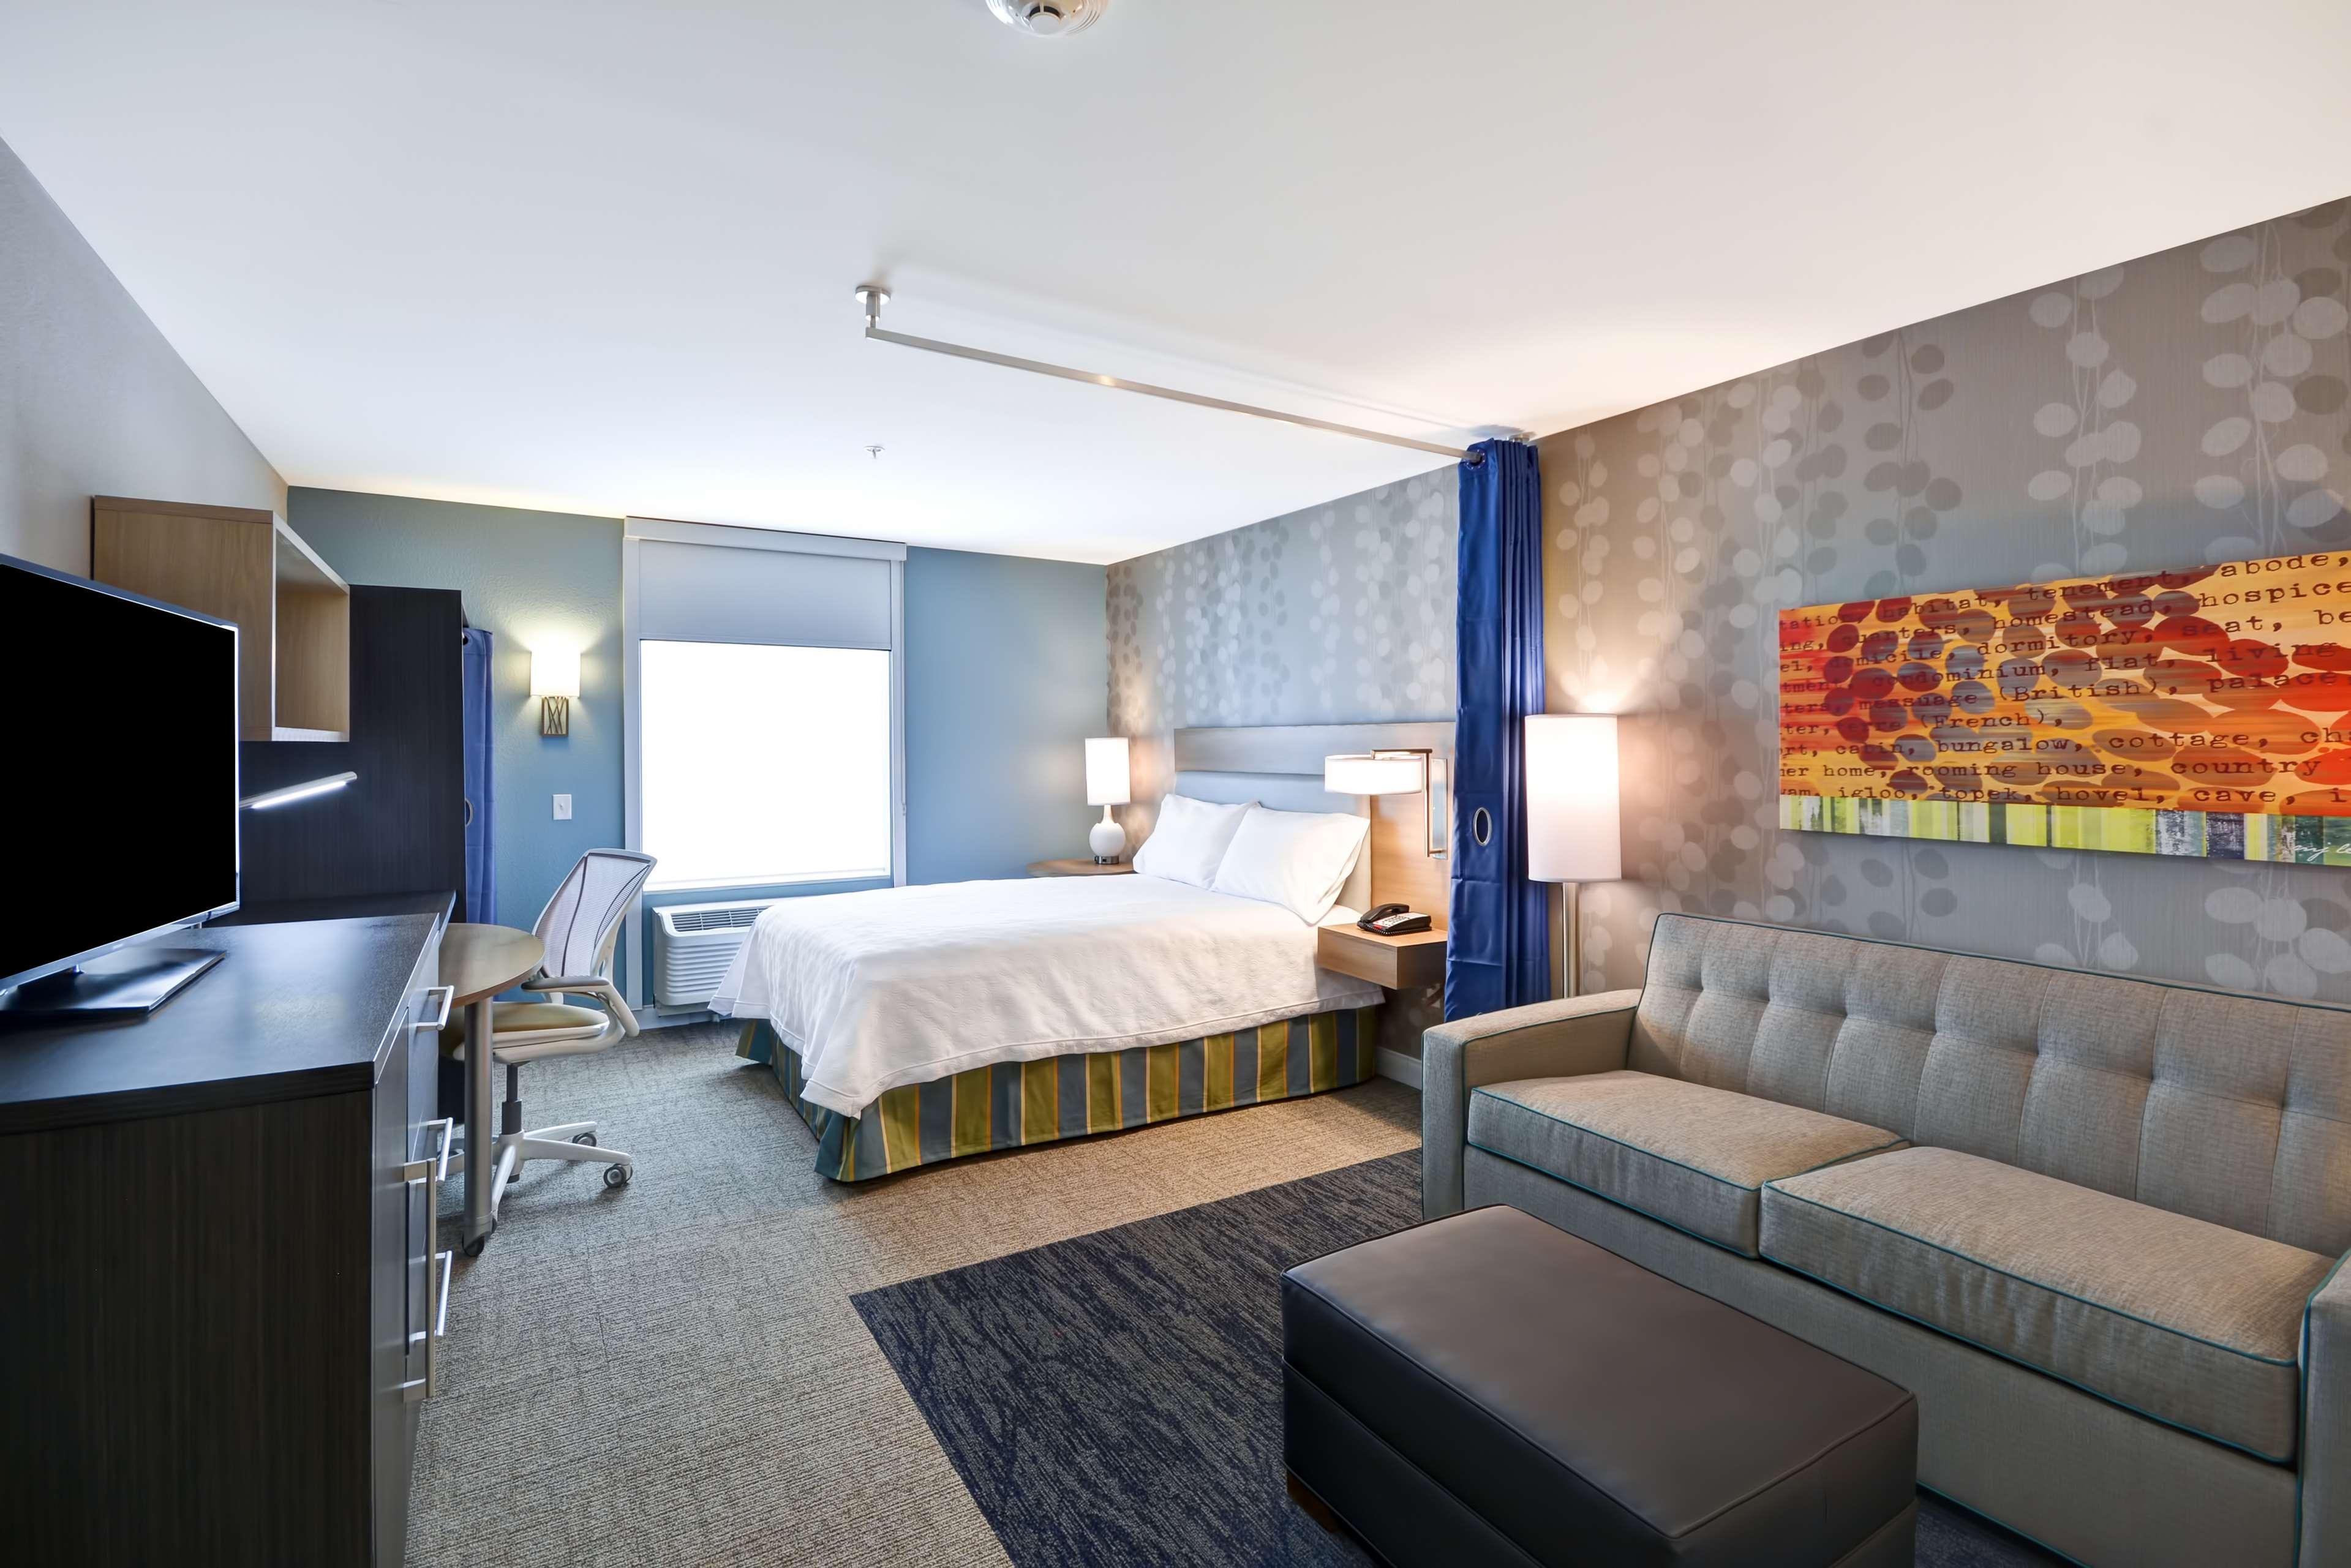 Home2 Suites by Hilton Jackson image 13